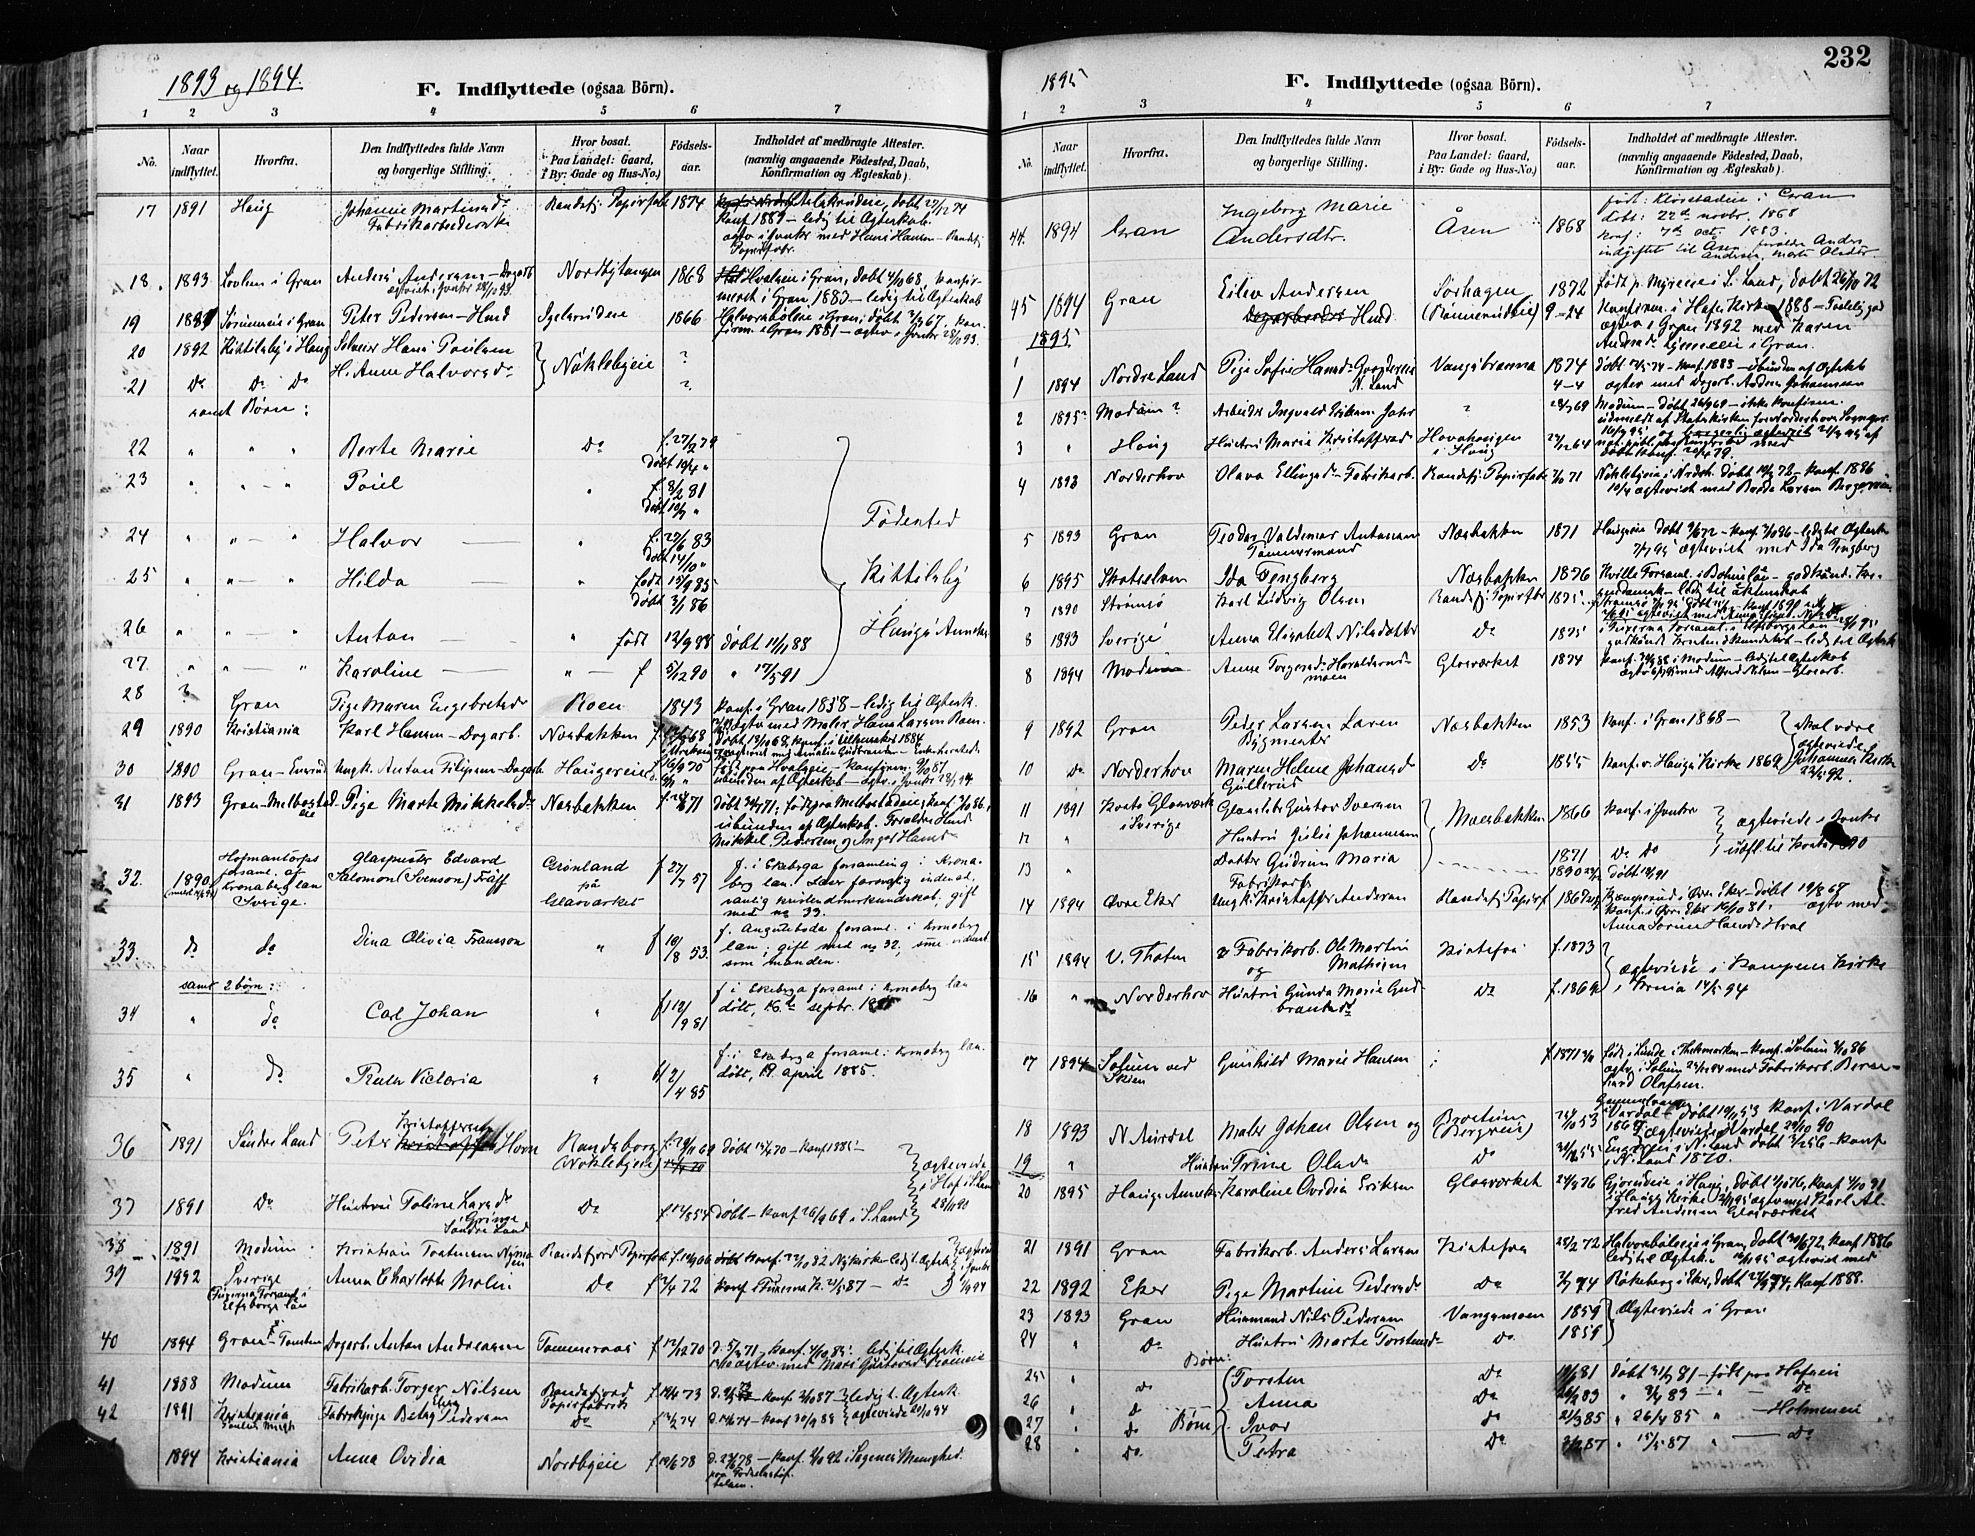 SAH, Jevnaker prestekontor, Ministerialbok nr. 9, 1891-1901, s. 232